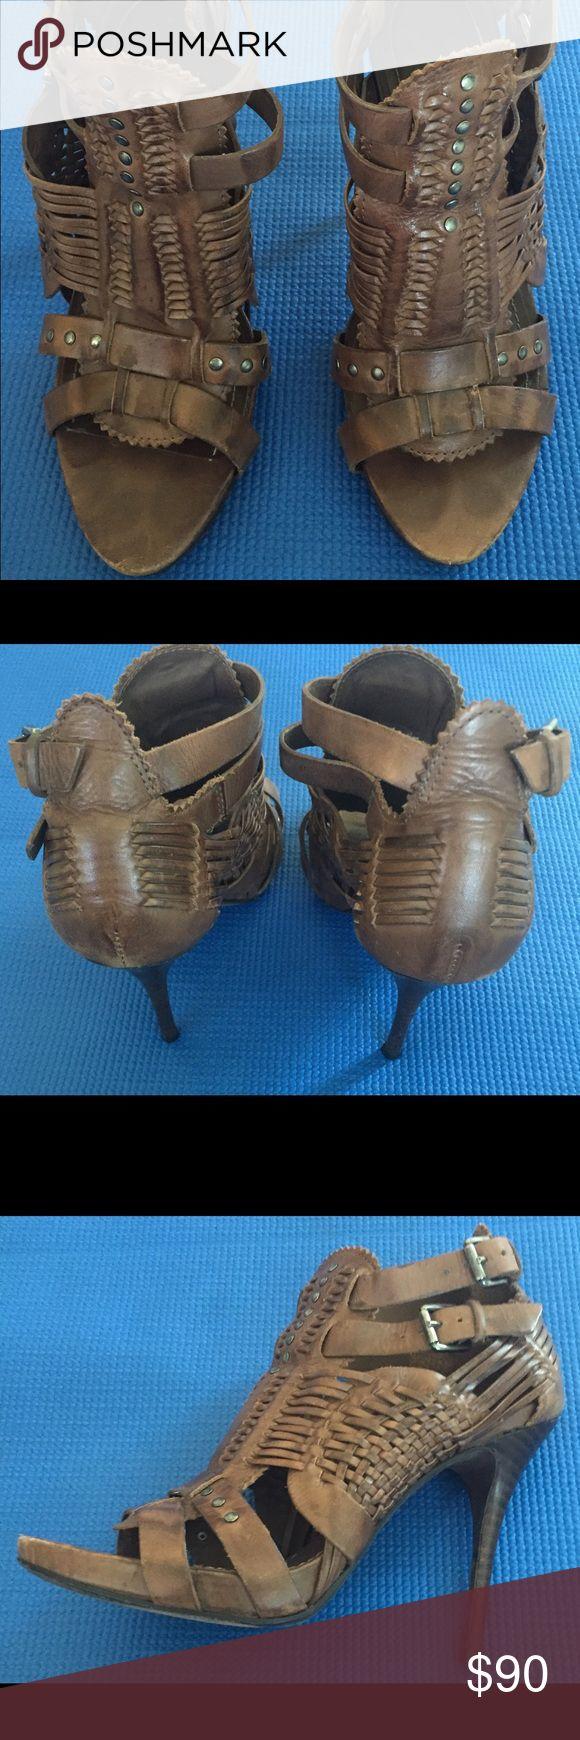 Allsaints Spitalfields heels Leather strappy heels Allsaints Spitalfields Shoes Heels